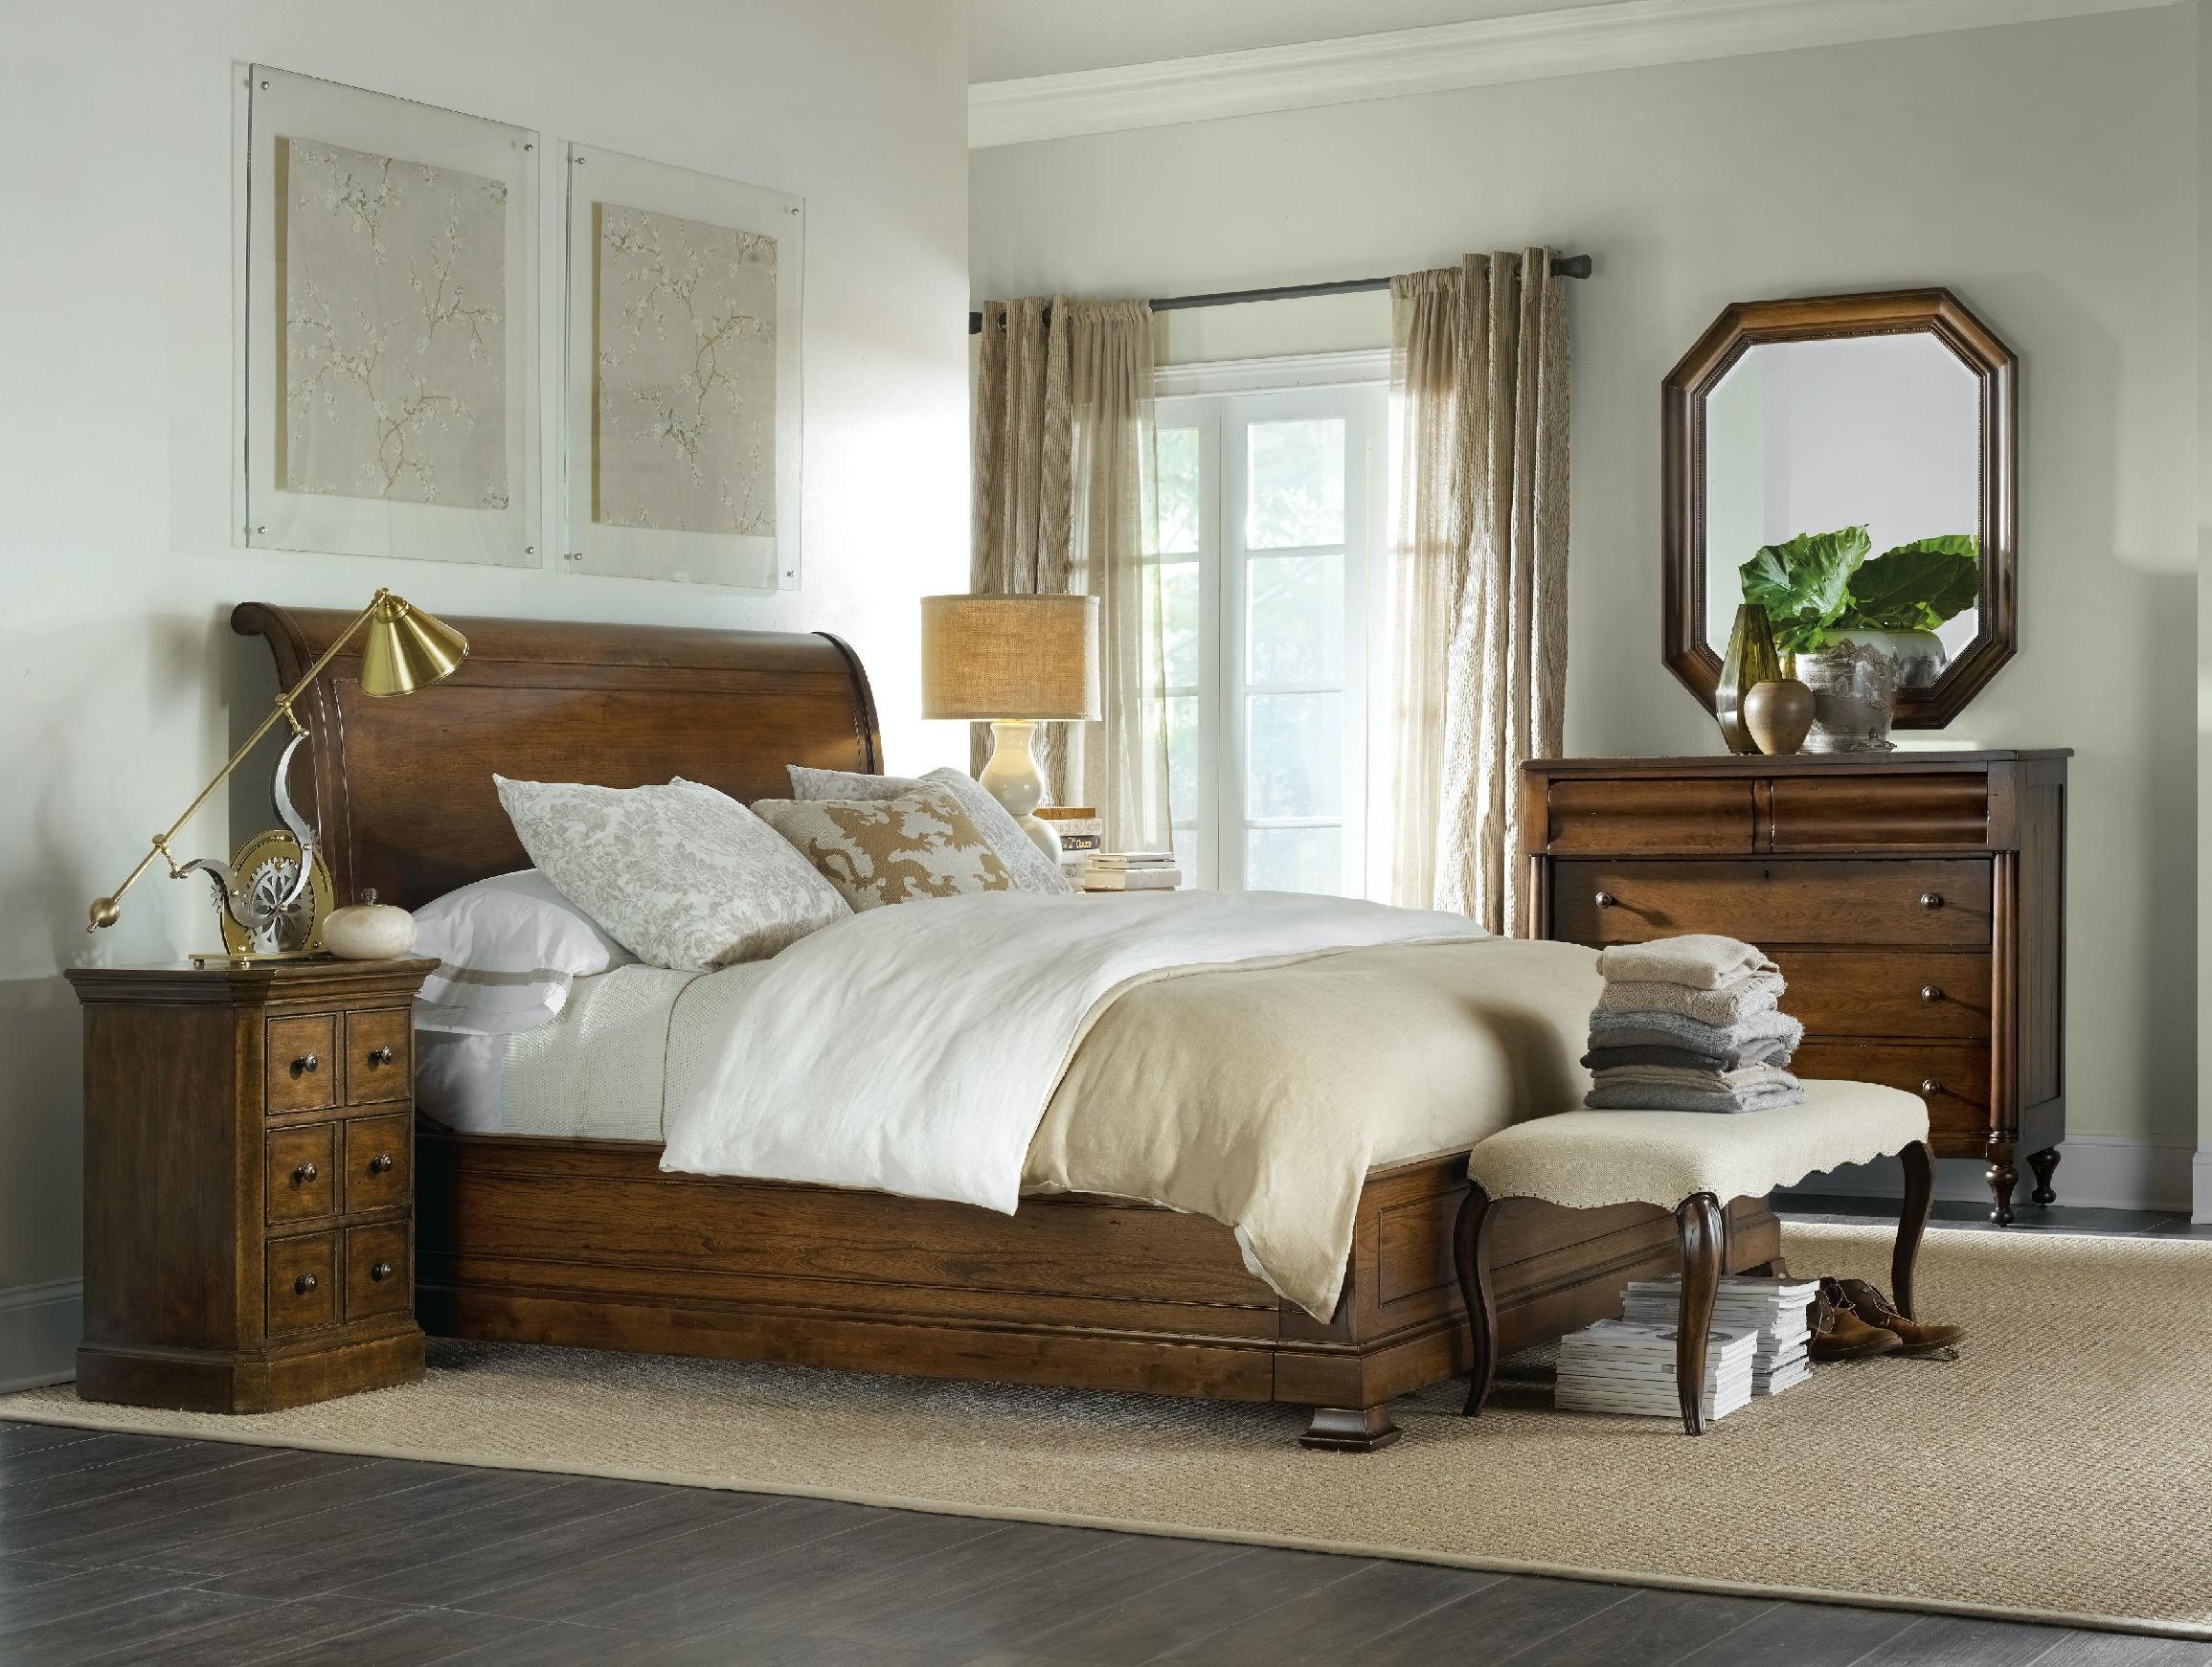 Hooker Furniture Bedroom Archivist Bench 5447-90019